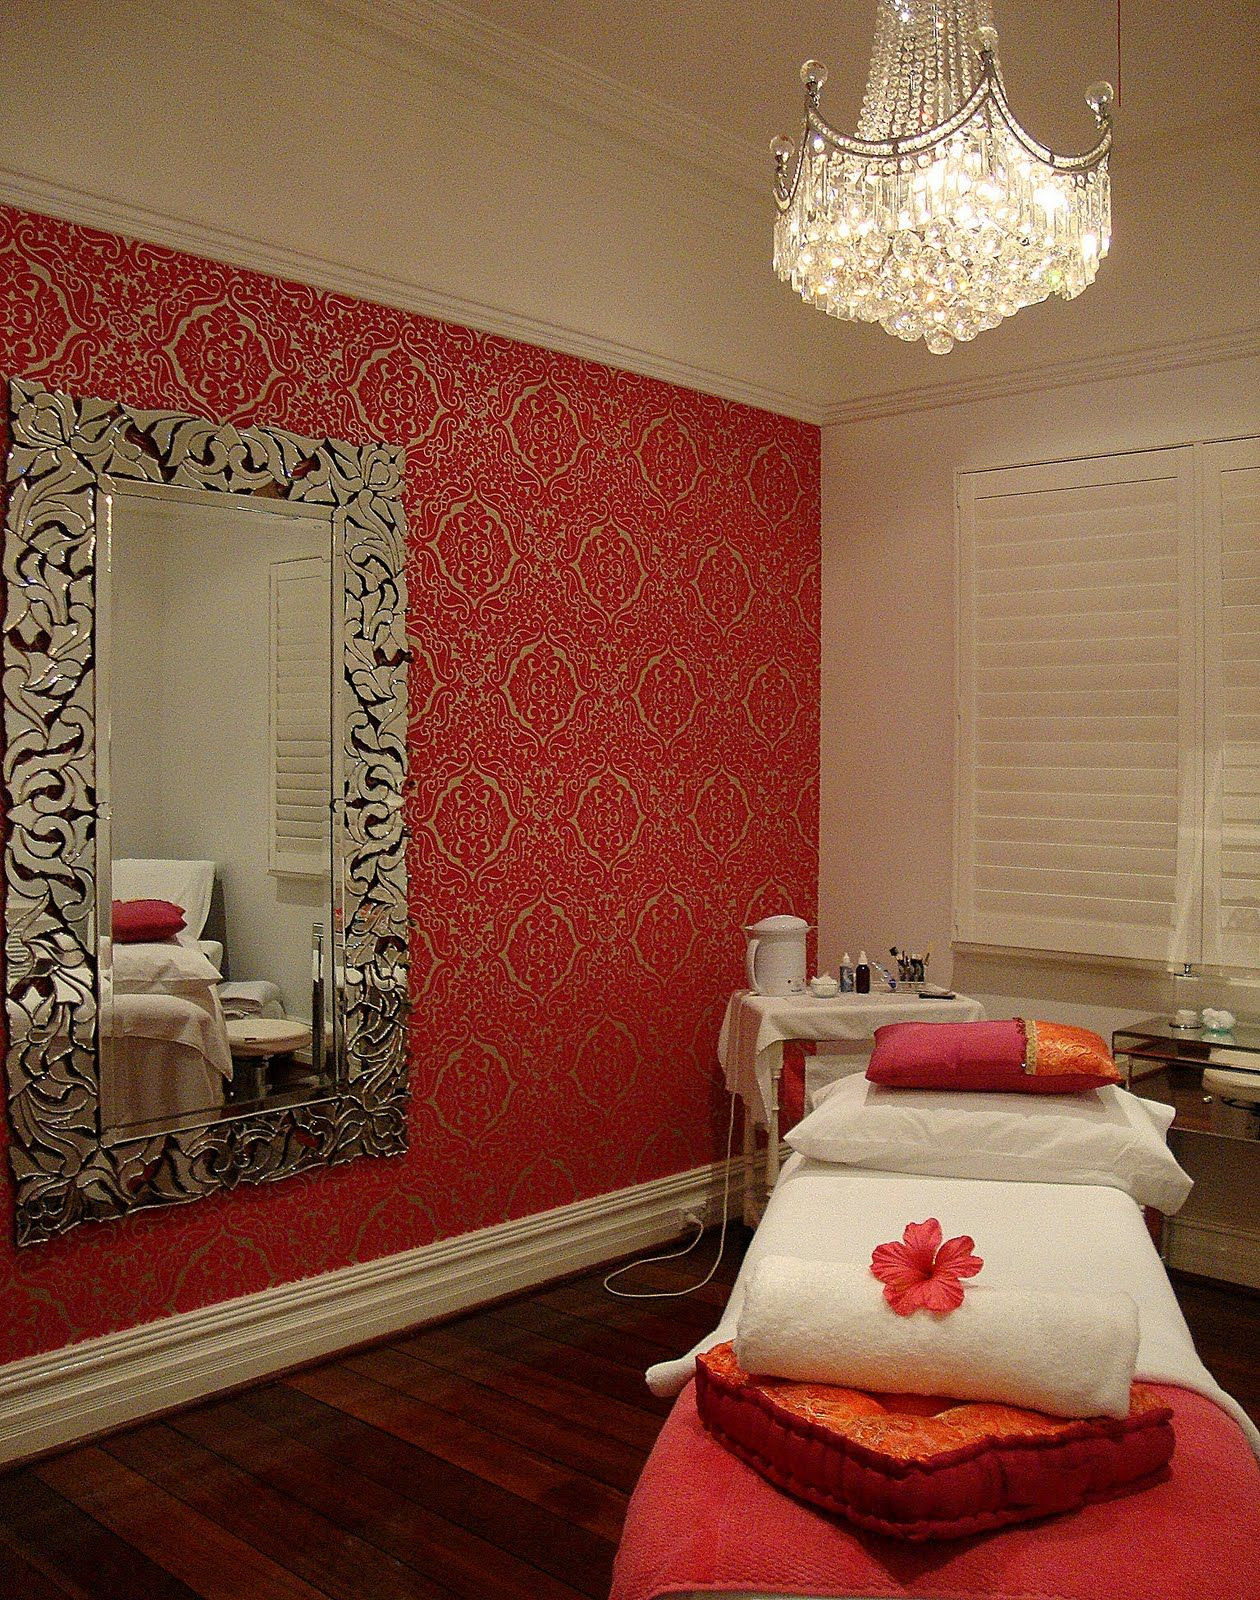 Best 25 Facial Room Ideas On Pinterest Spa Facial Room